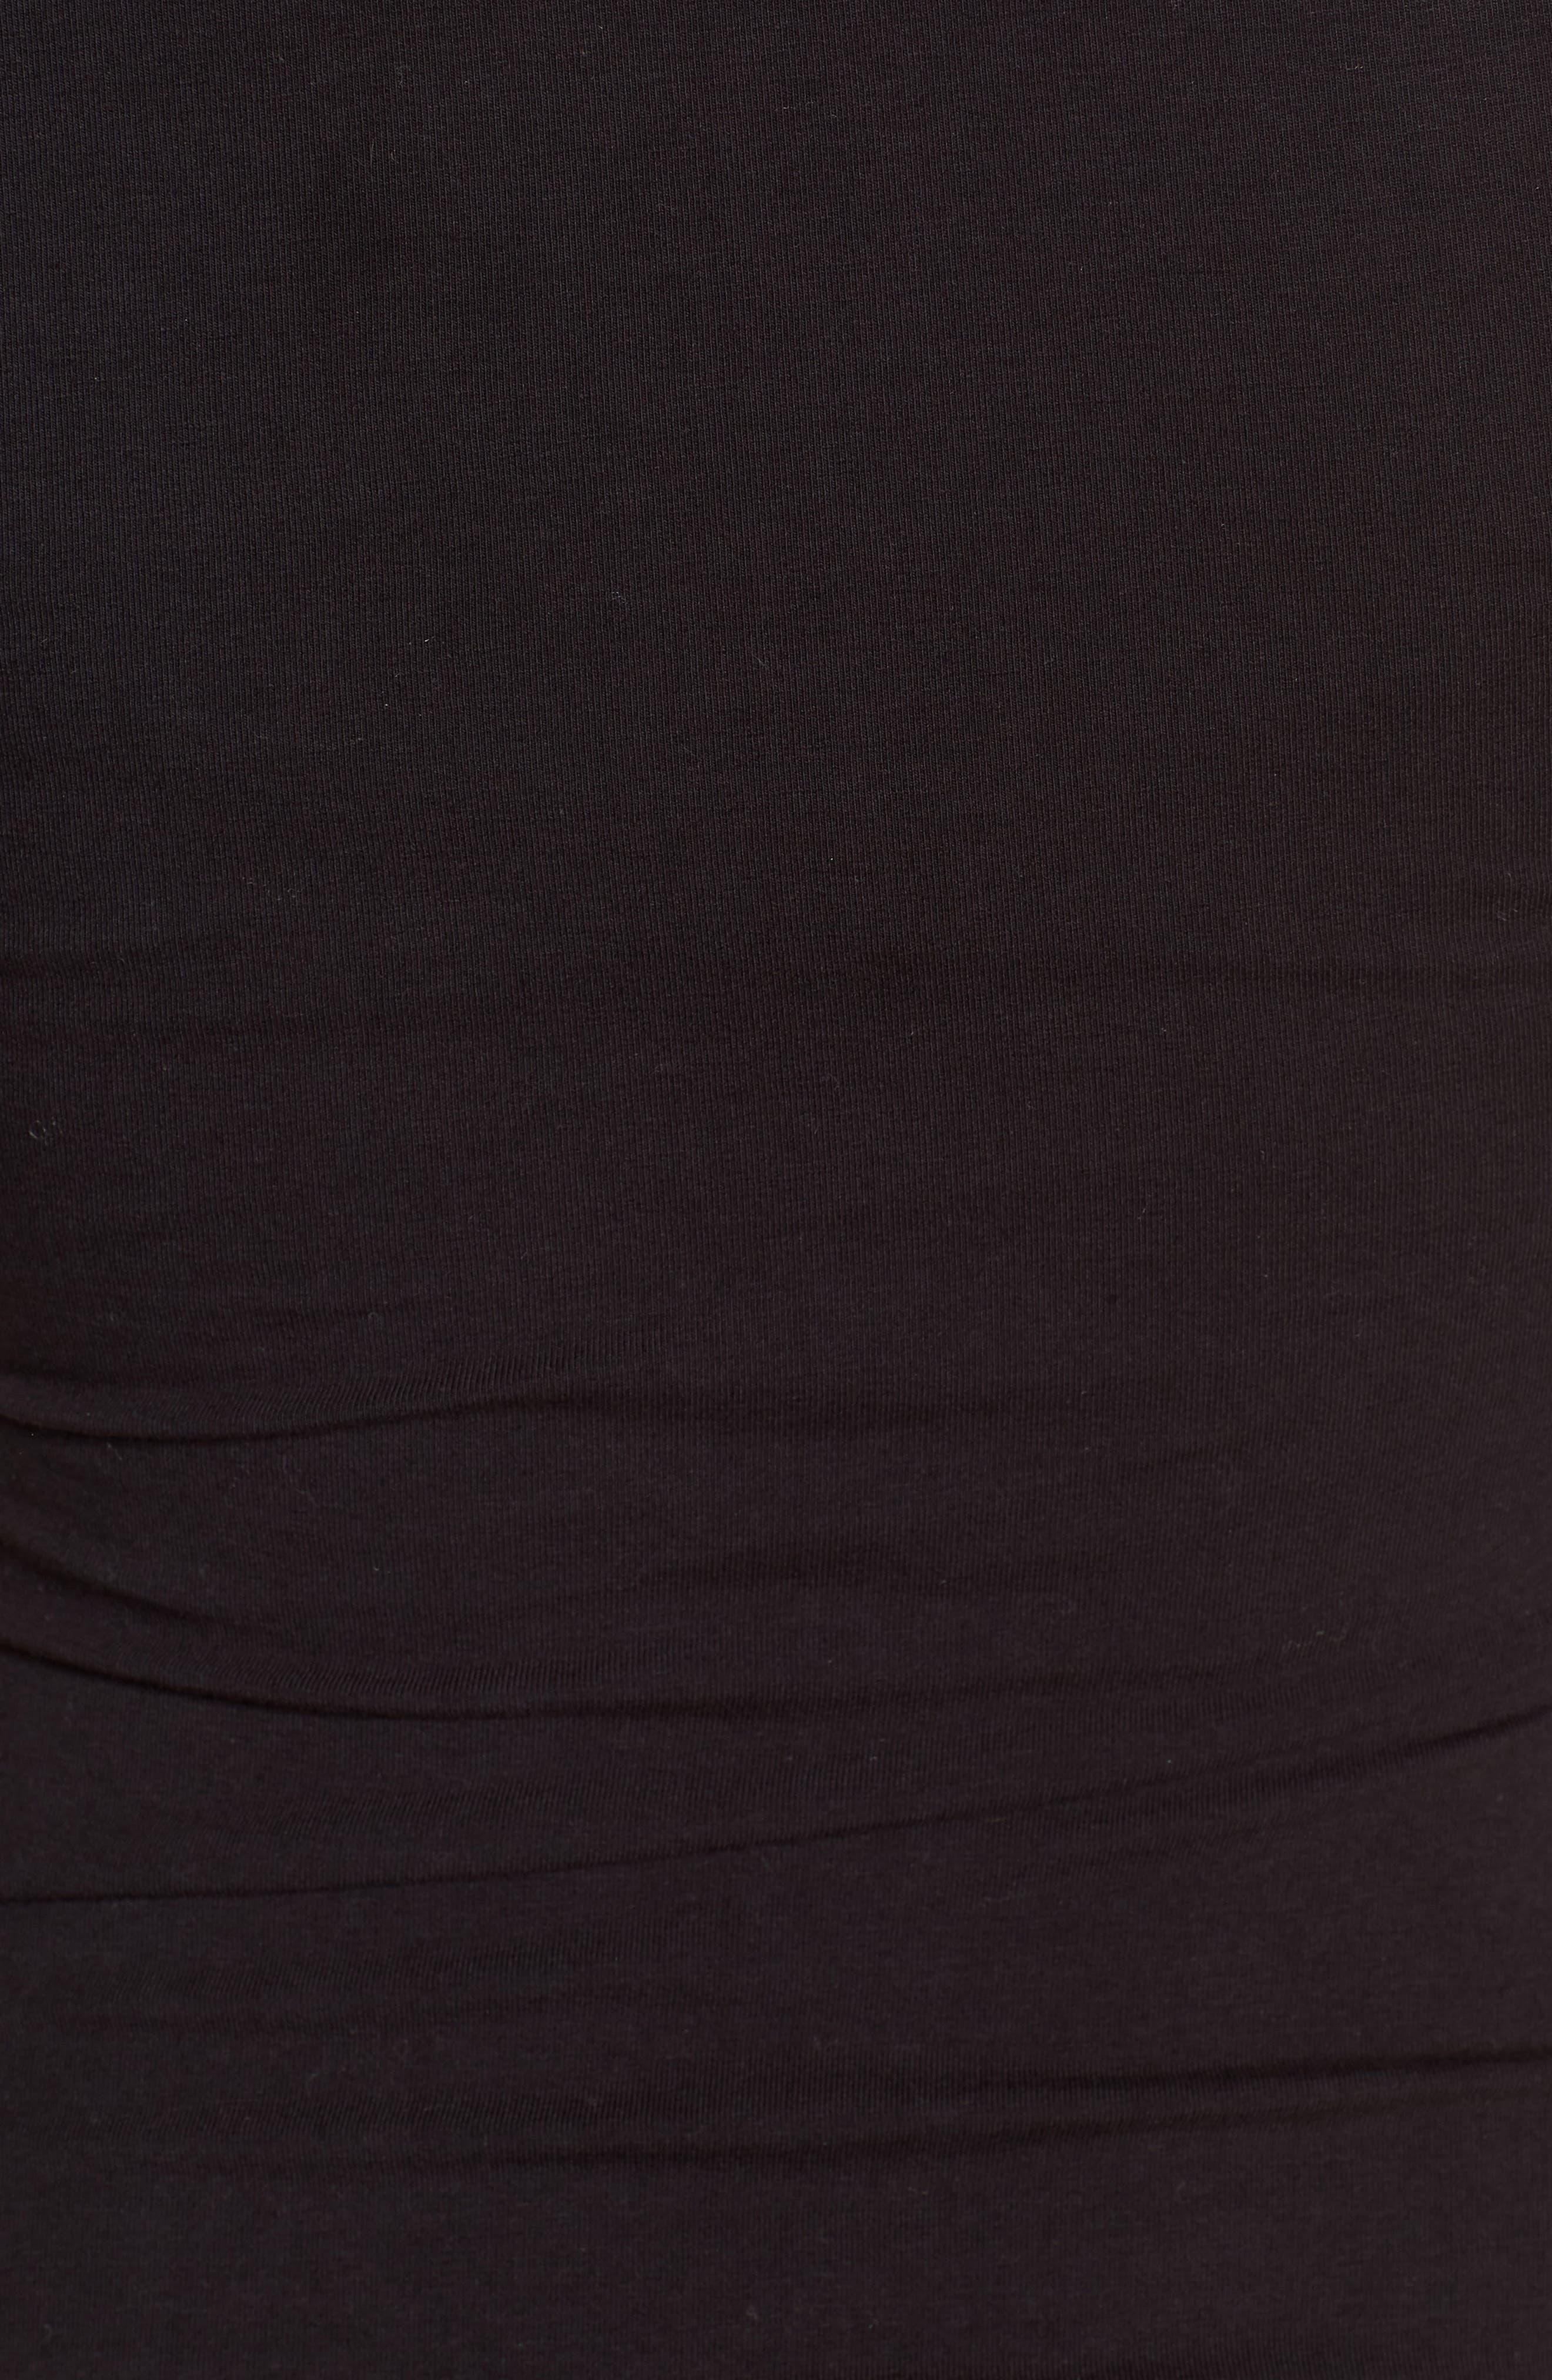 MICHAEL STARS,                             Ruched Surplice Stretch Cotton Body-Con Dress,                             Alternate thumbnail 6, color,                             001